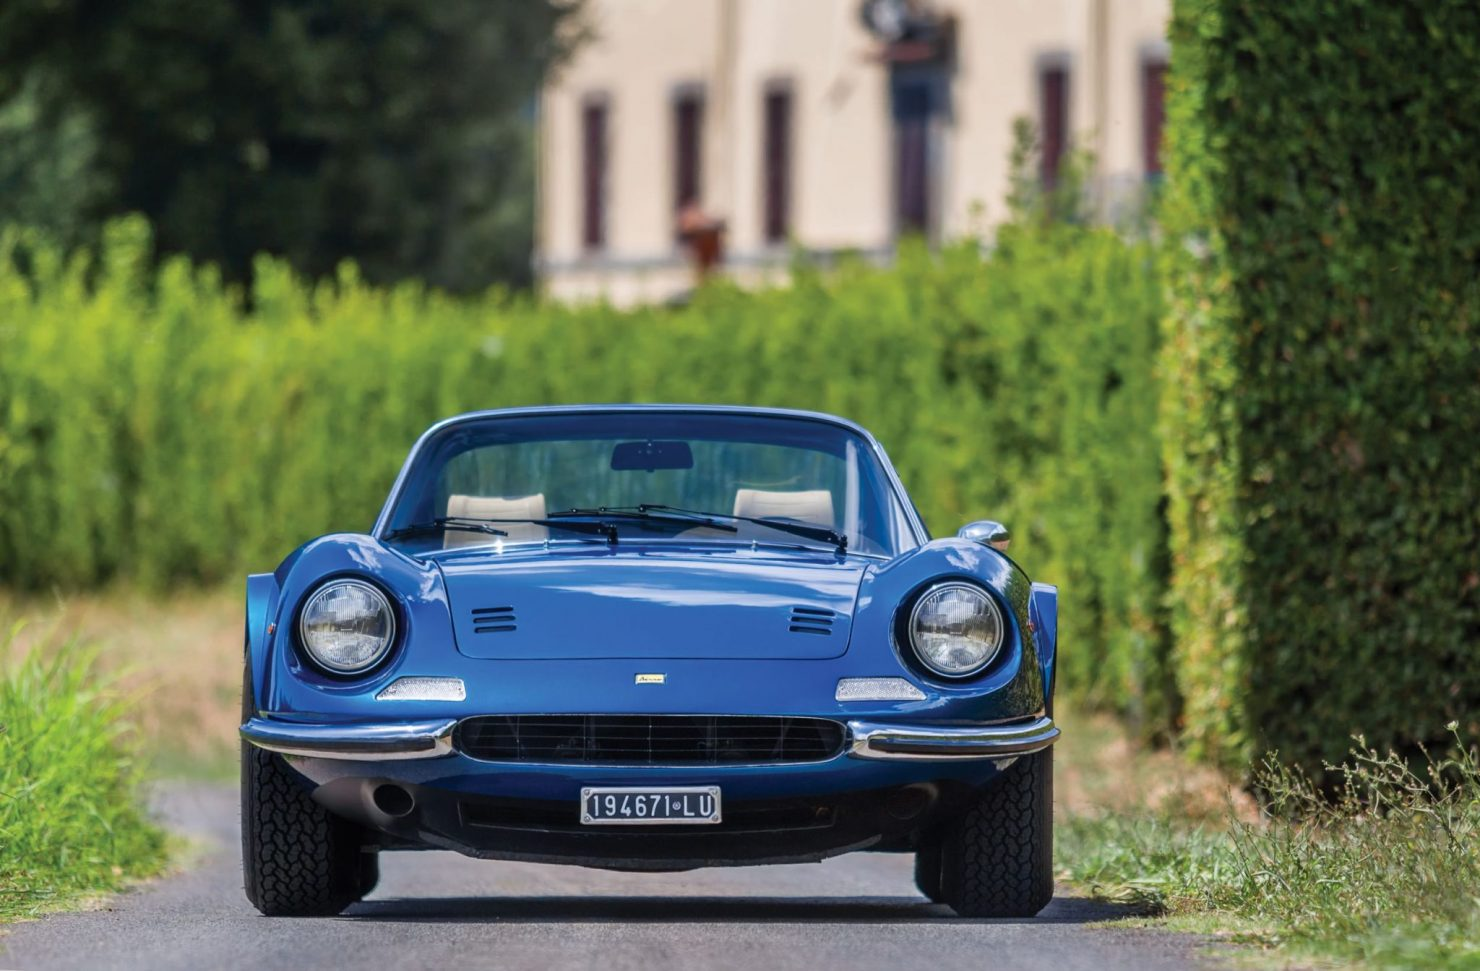 ferrari dino 246 gts car 8 1480x971 - 1973 Ferrari Dino 246 GTS